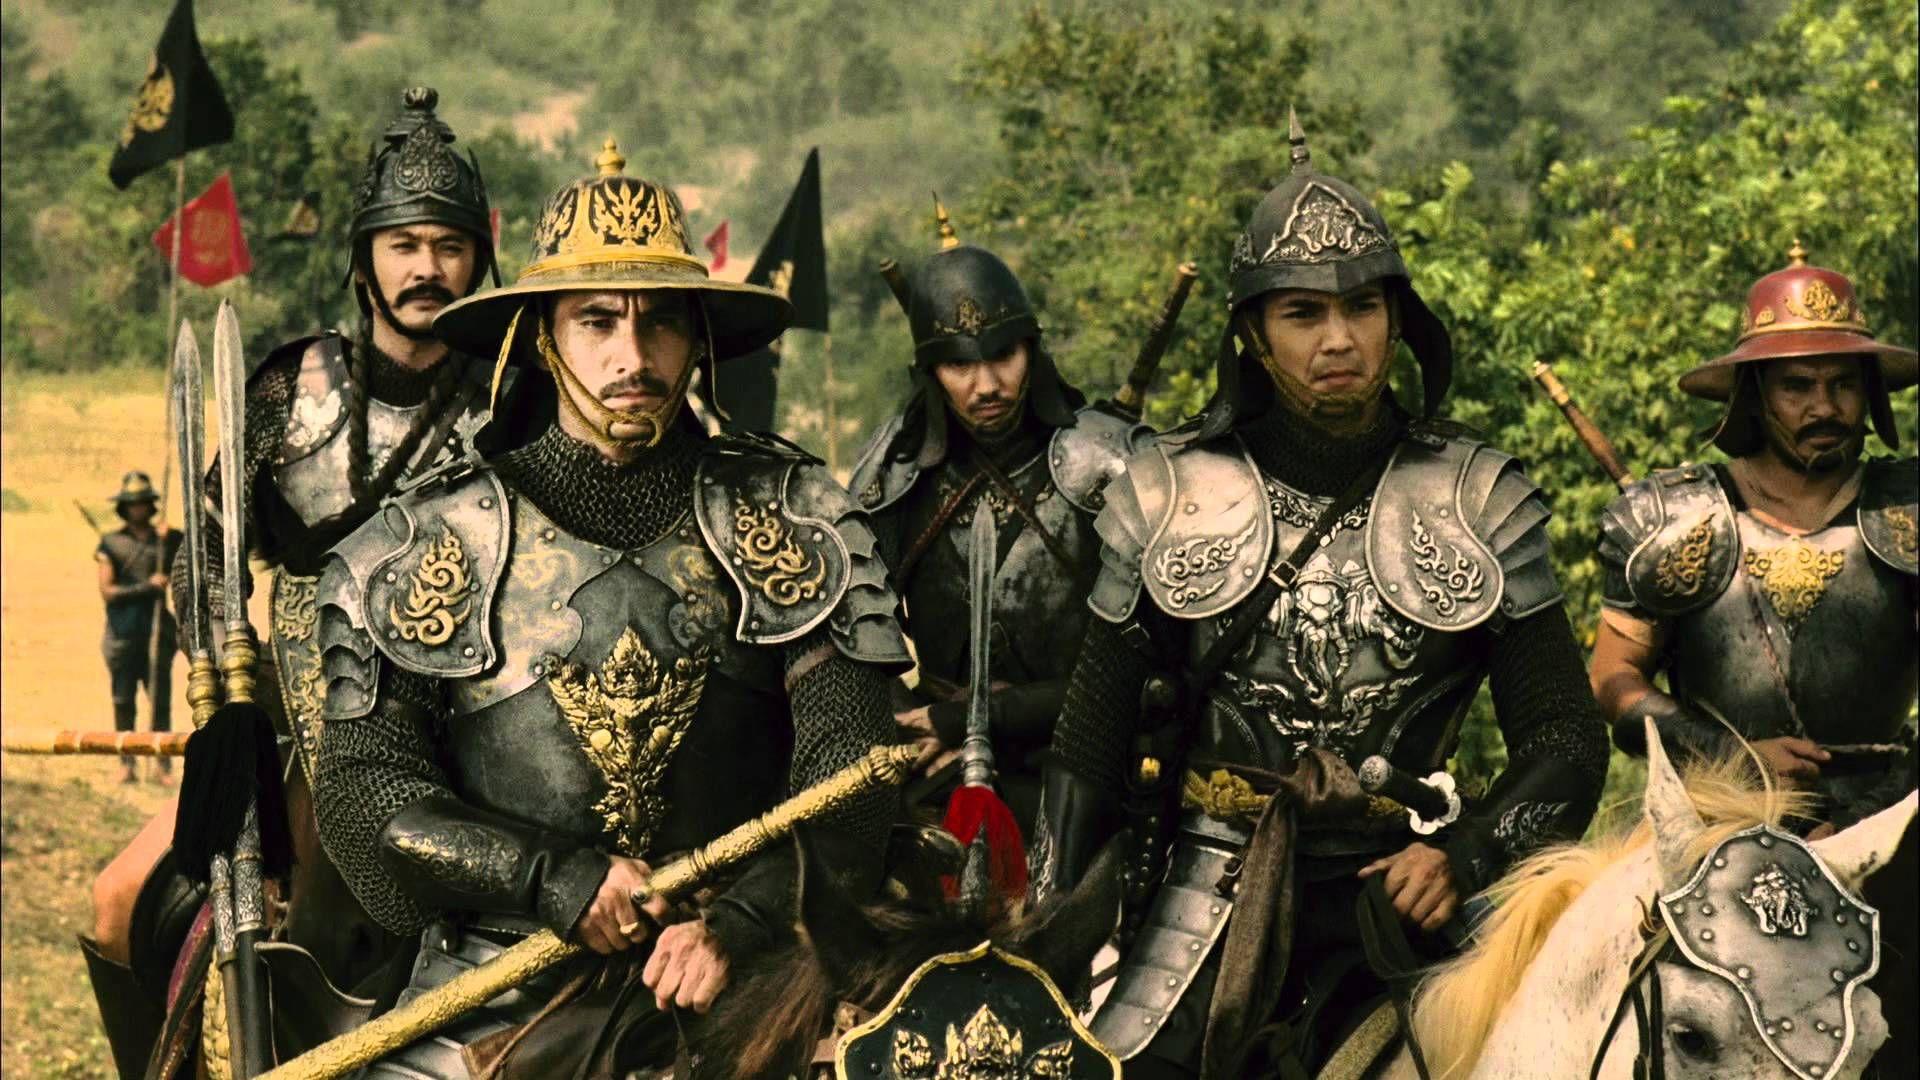 Kingdom Of War Part 2 Clip Ancient War Historical Men Historical Film